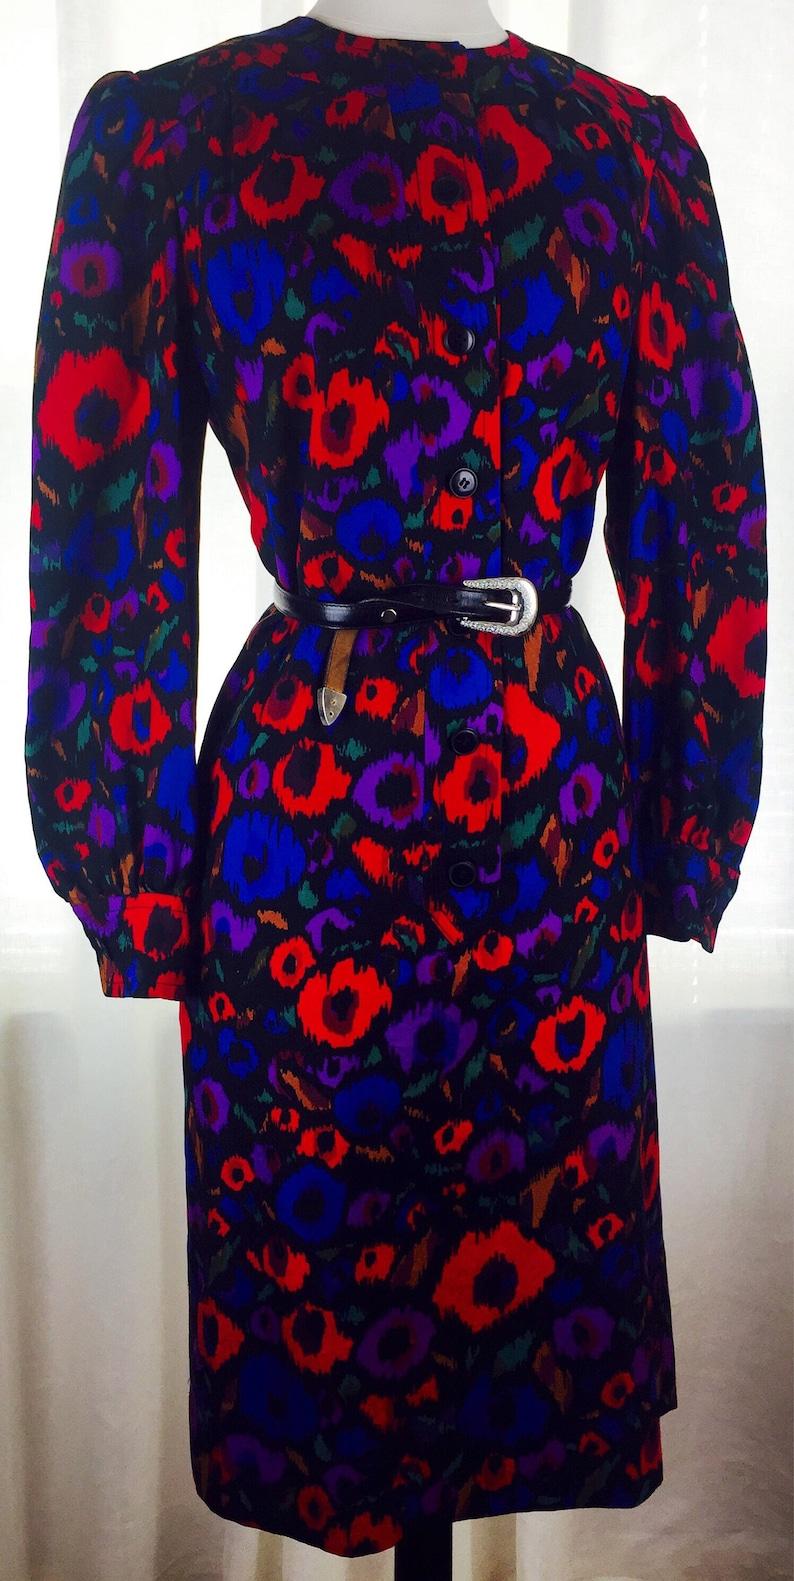 8bbd6b21bdf Vintage 80 s rainbow animal print button down dress